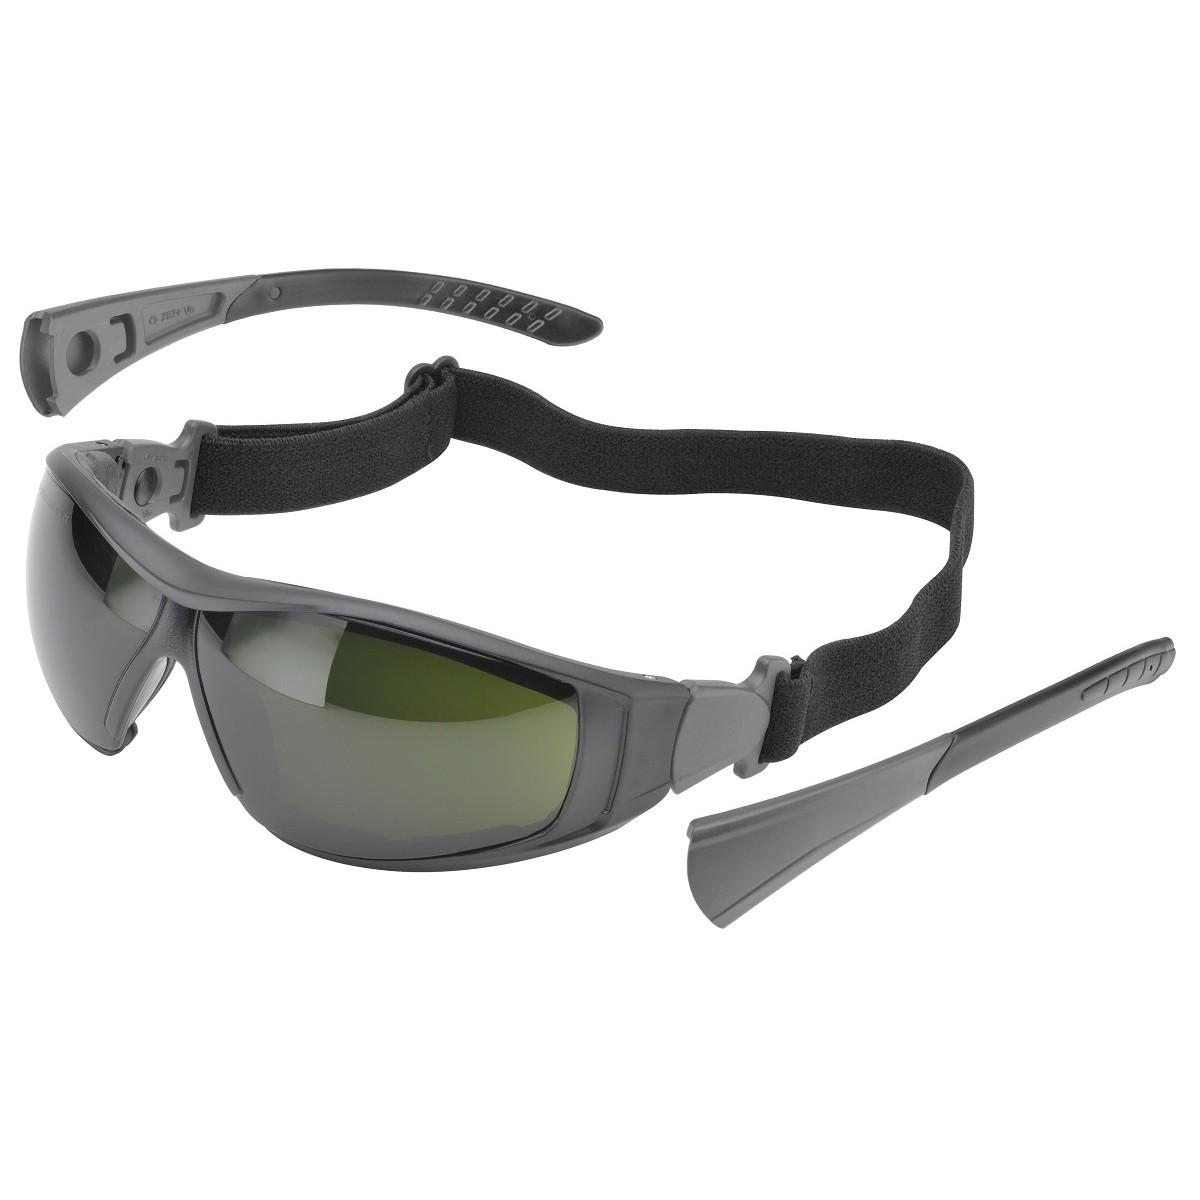 Glasses Frame Welding : Elvex Go-Specs II Safety Glasses/Goggles - Black Frame ...